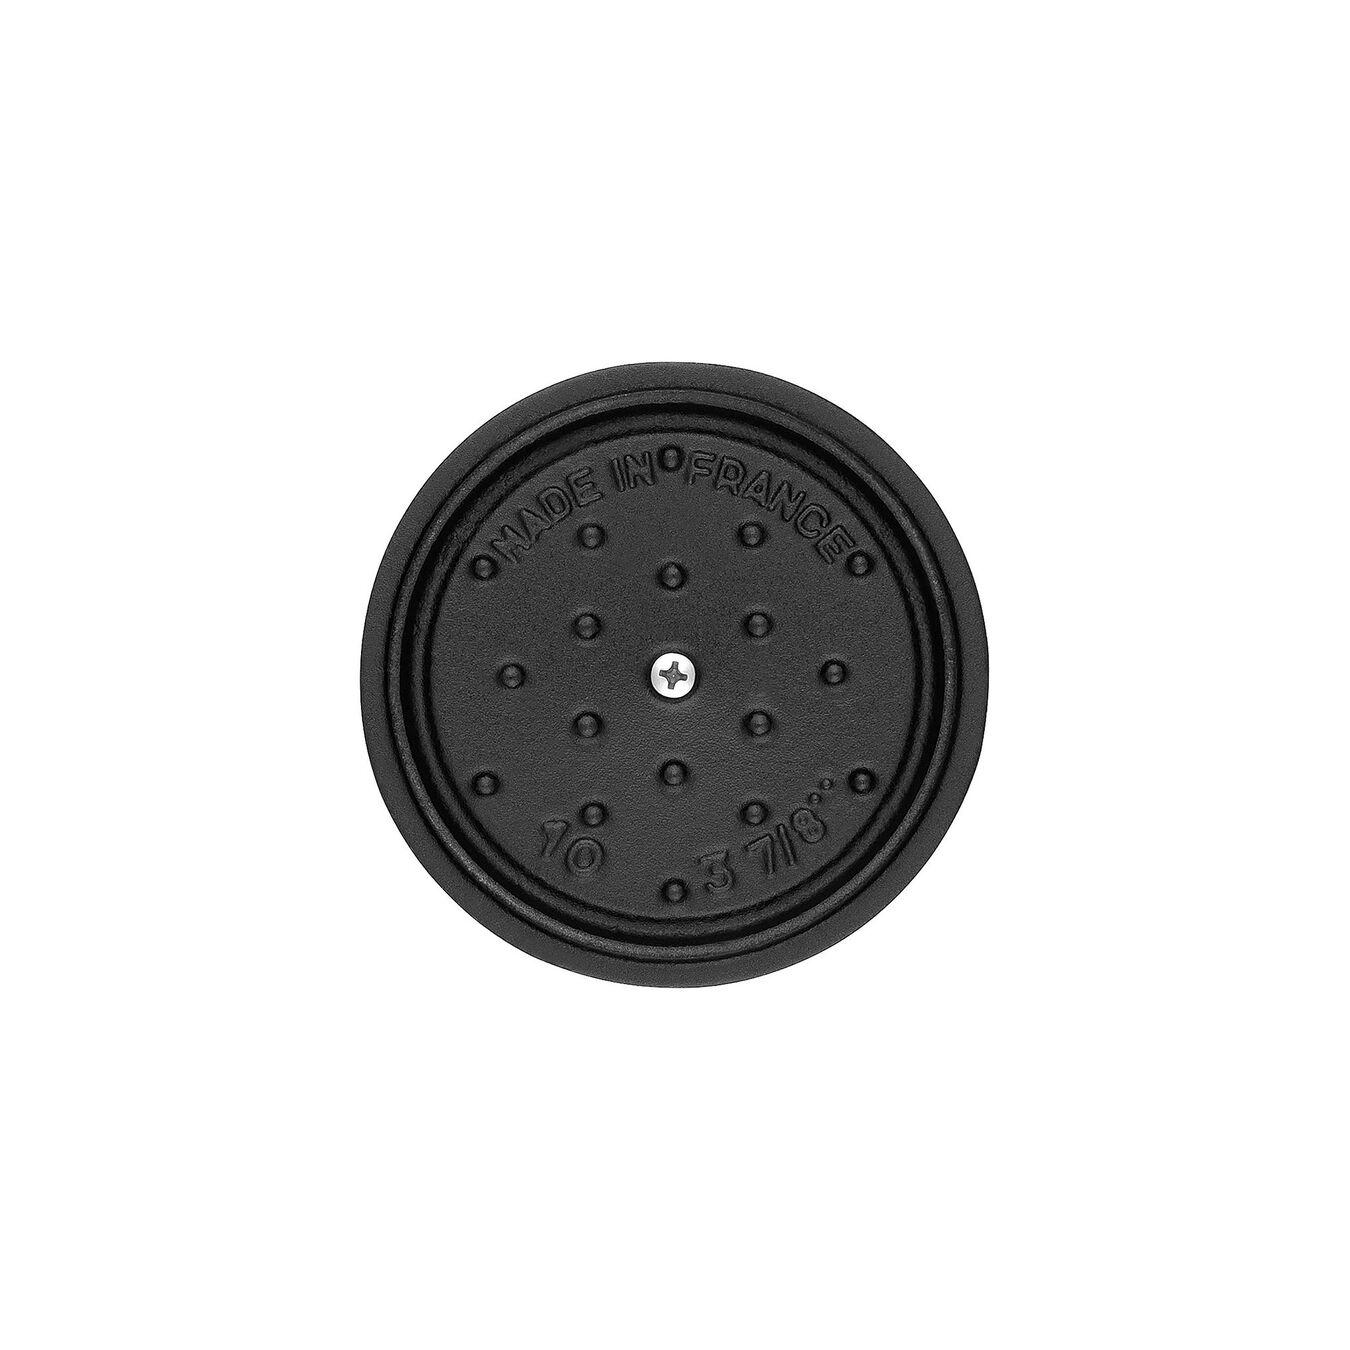 Mini cocotte rotonda - 10 cm, nero,,large 2